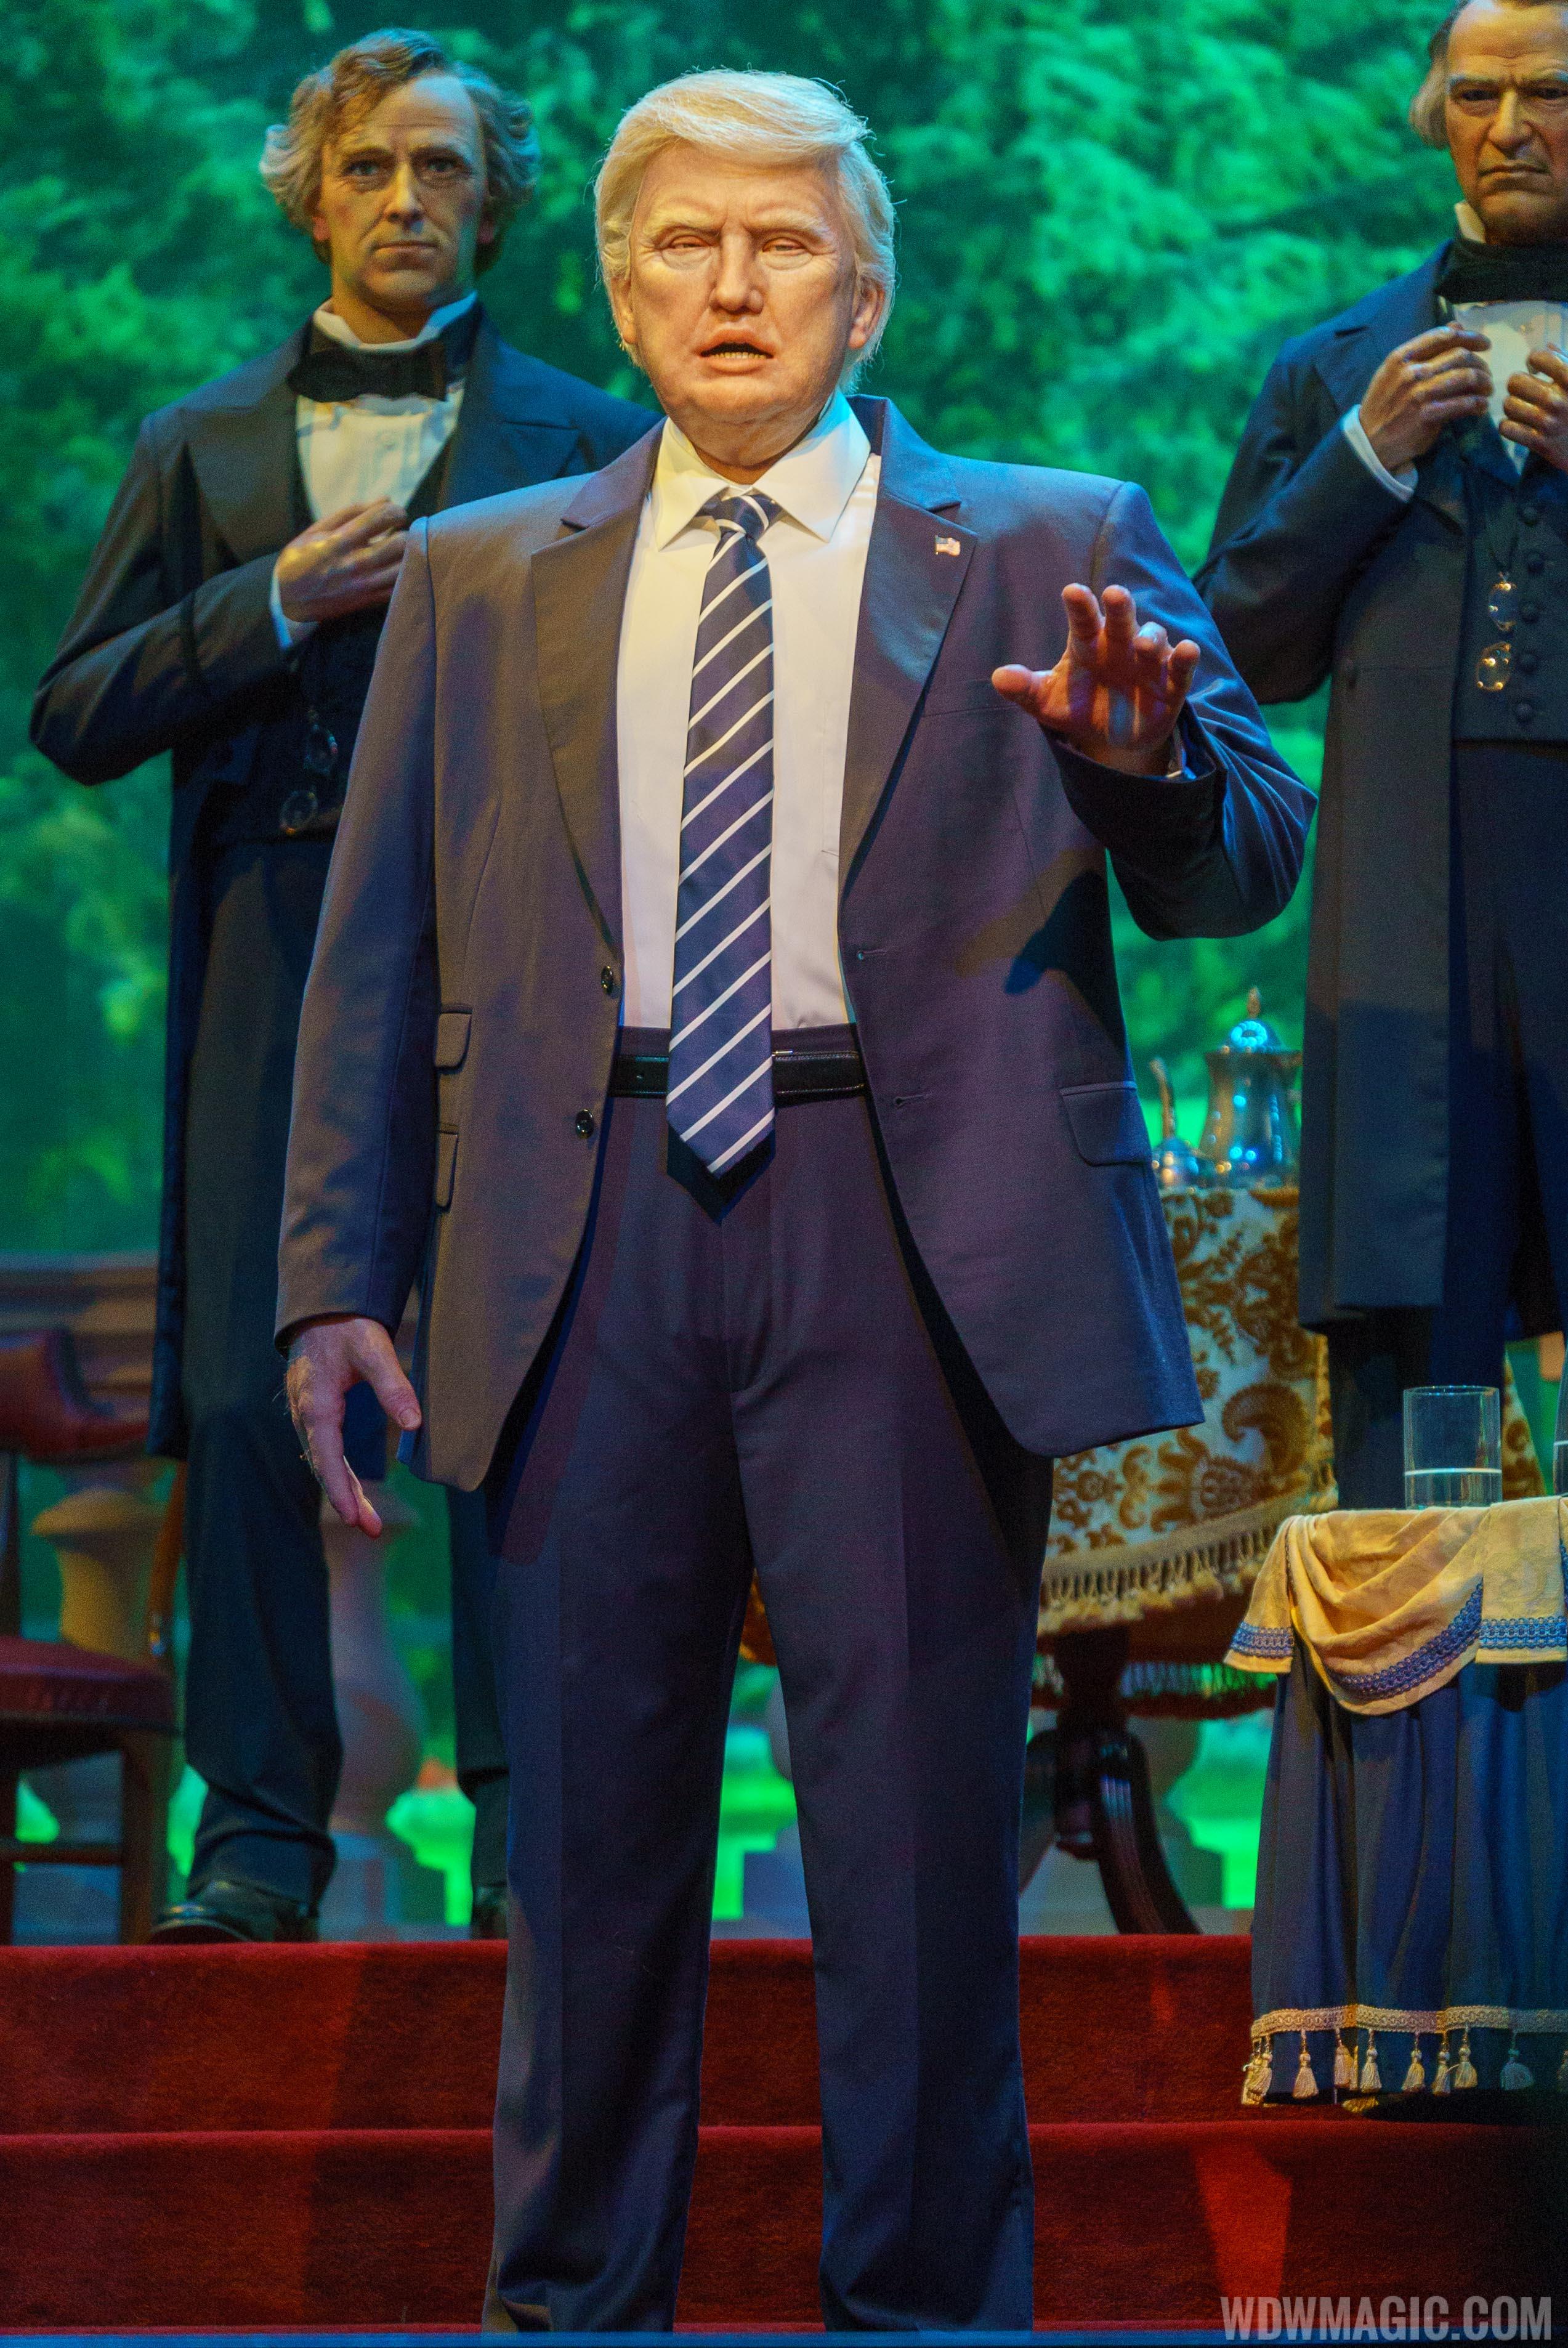 Donald Trump audio-animatronic figure